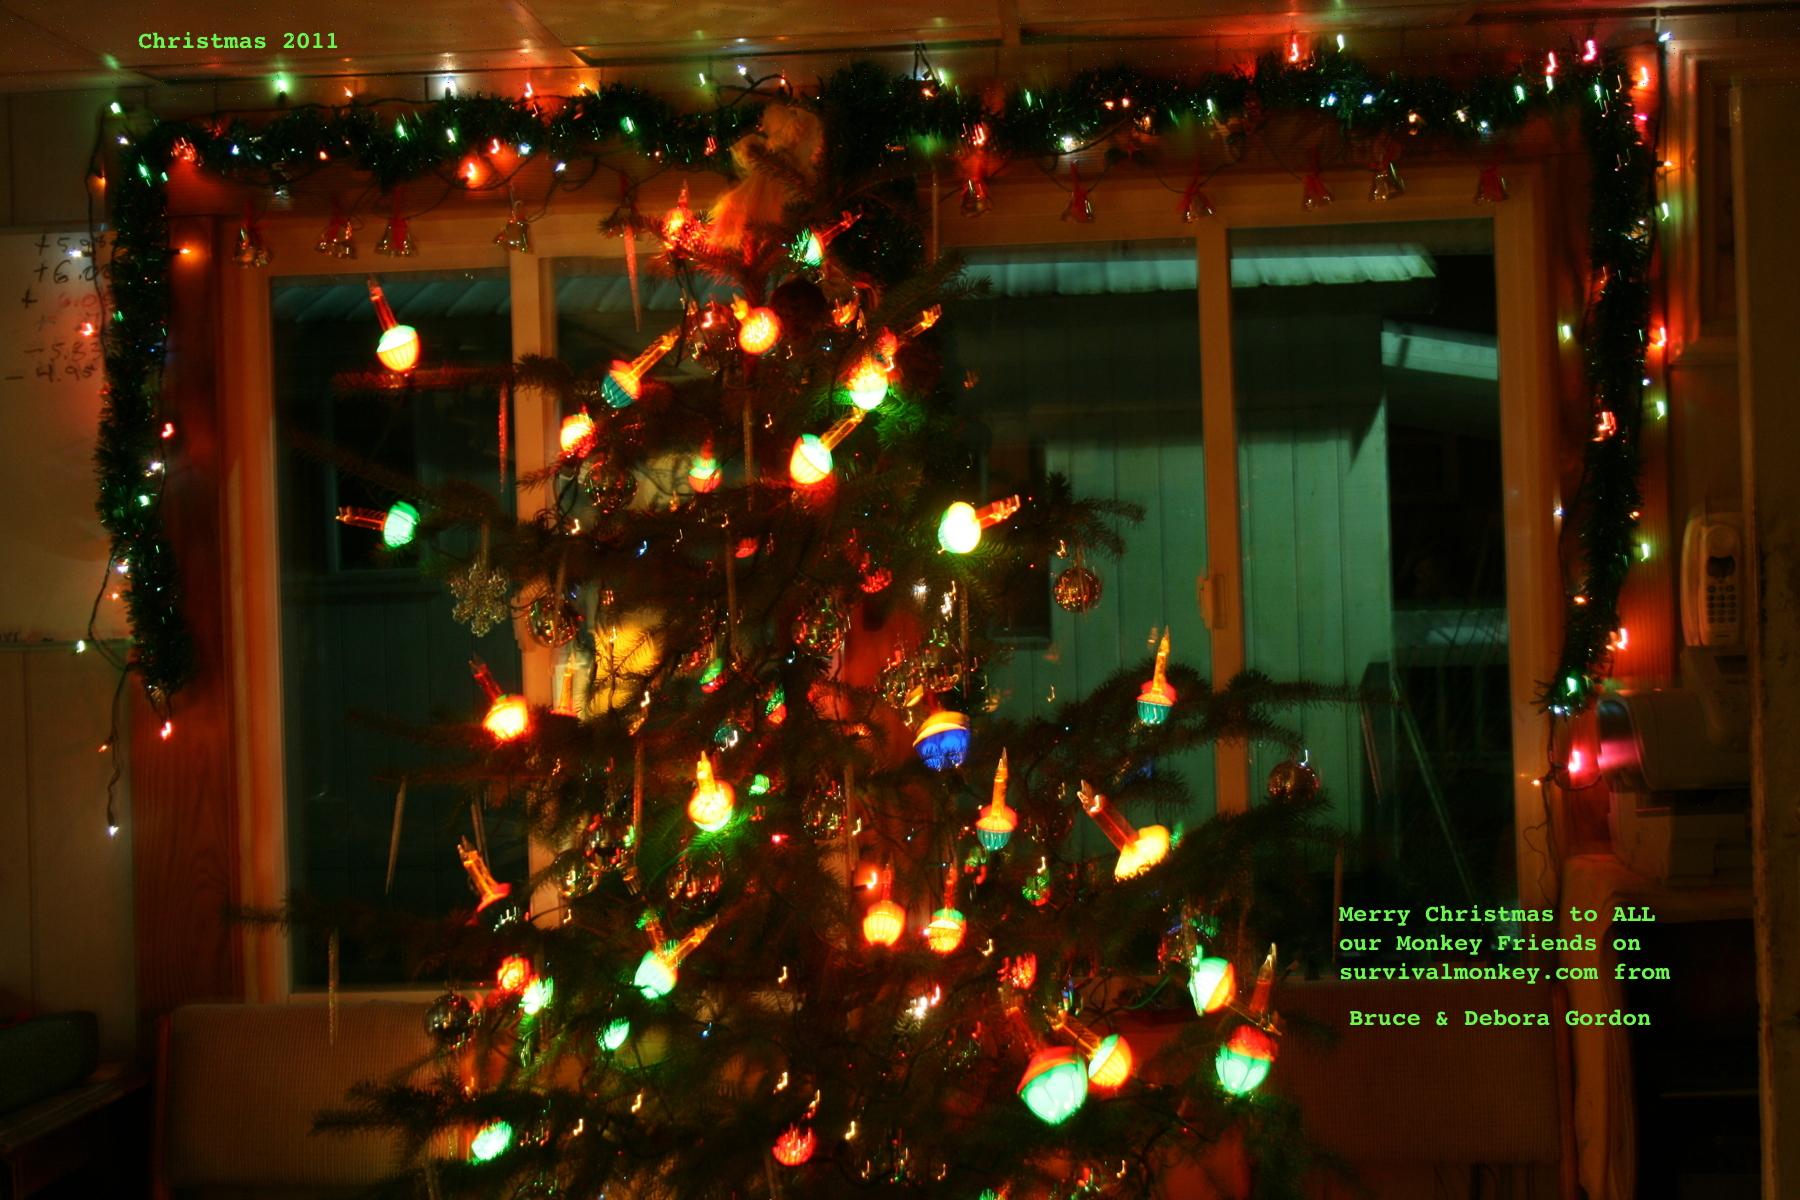 stego-Christmas-2011a.